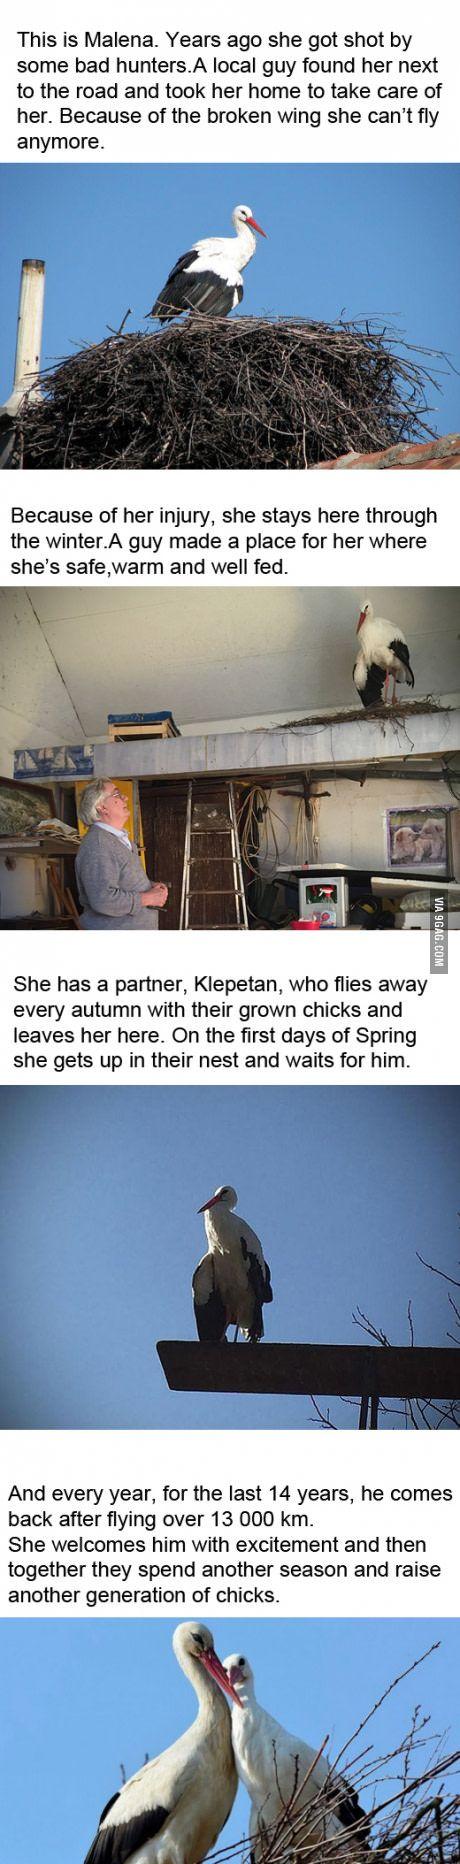 A heartwarming love story from Croatia: